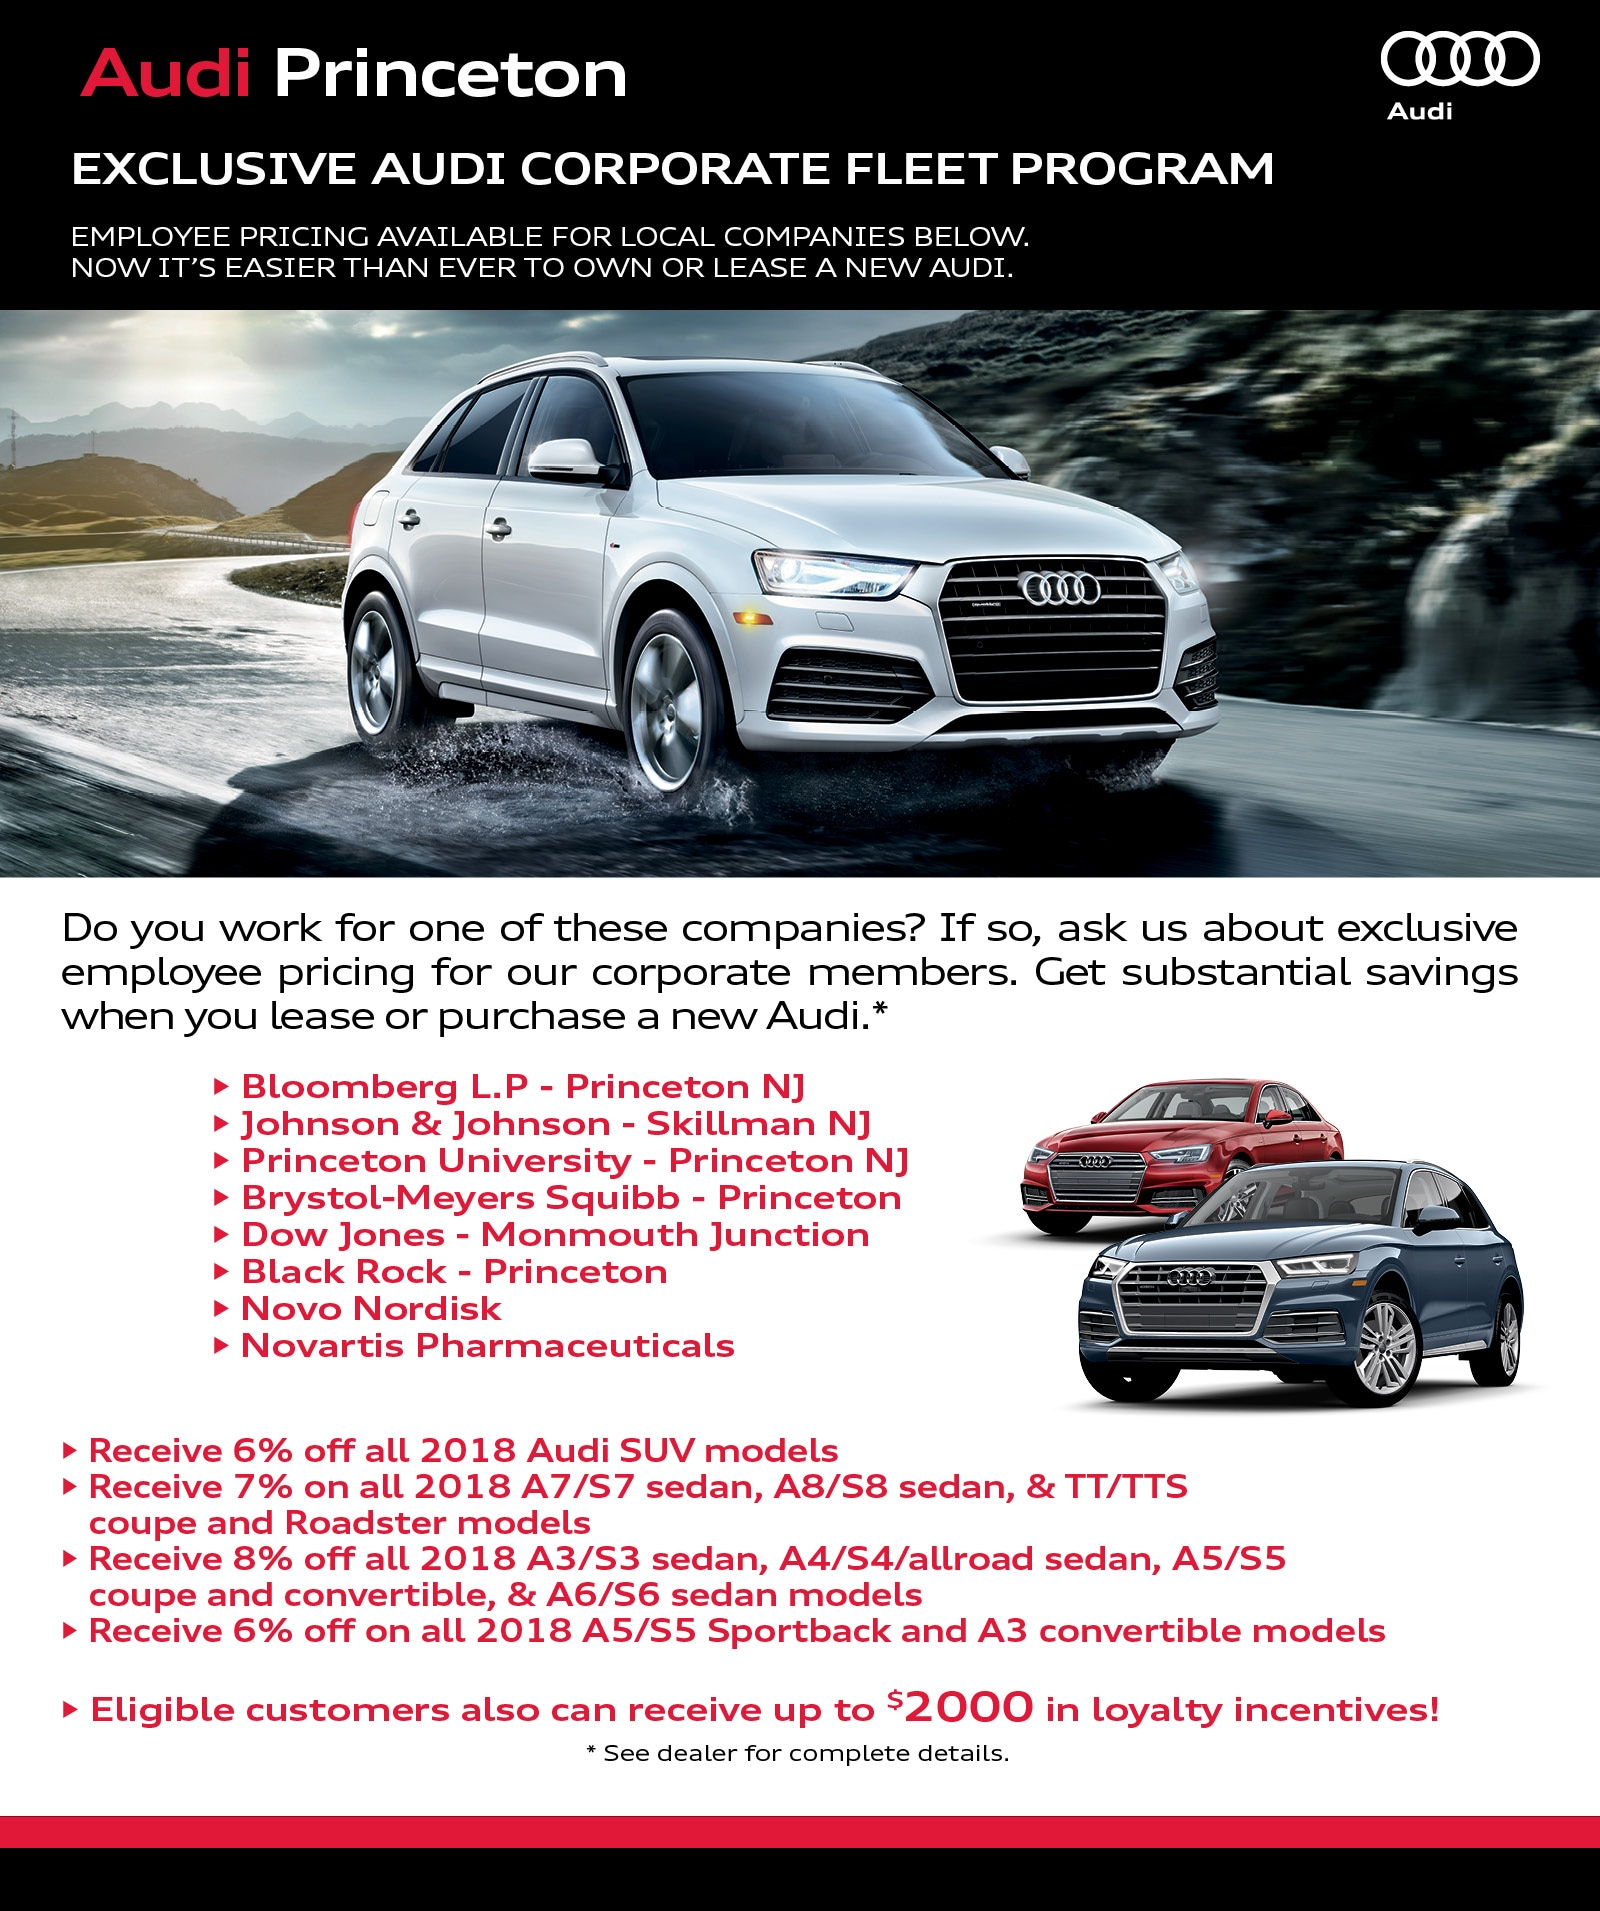 Audi Princeton